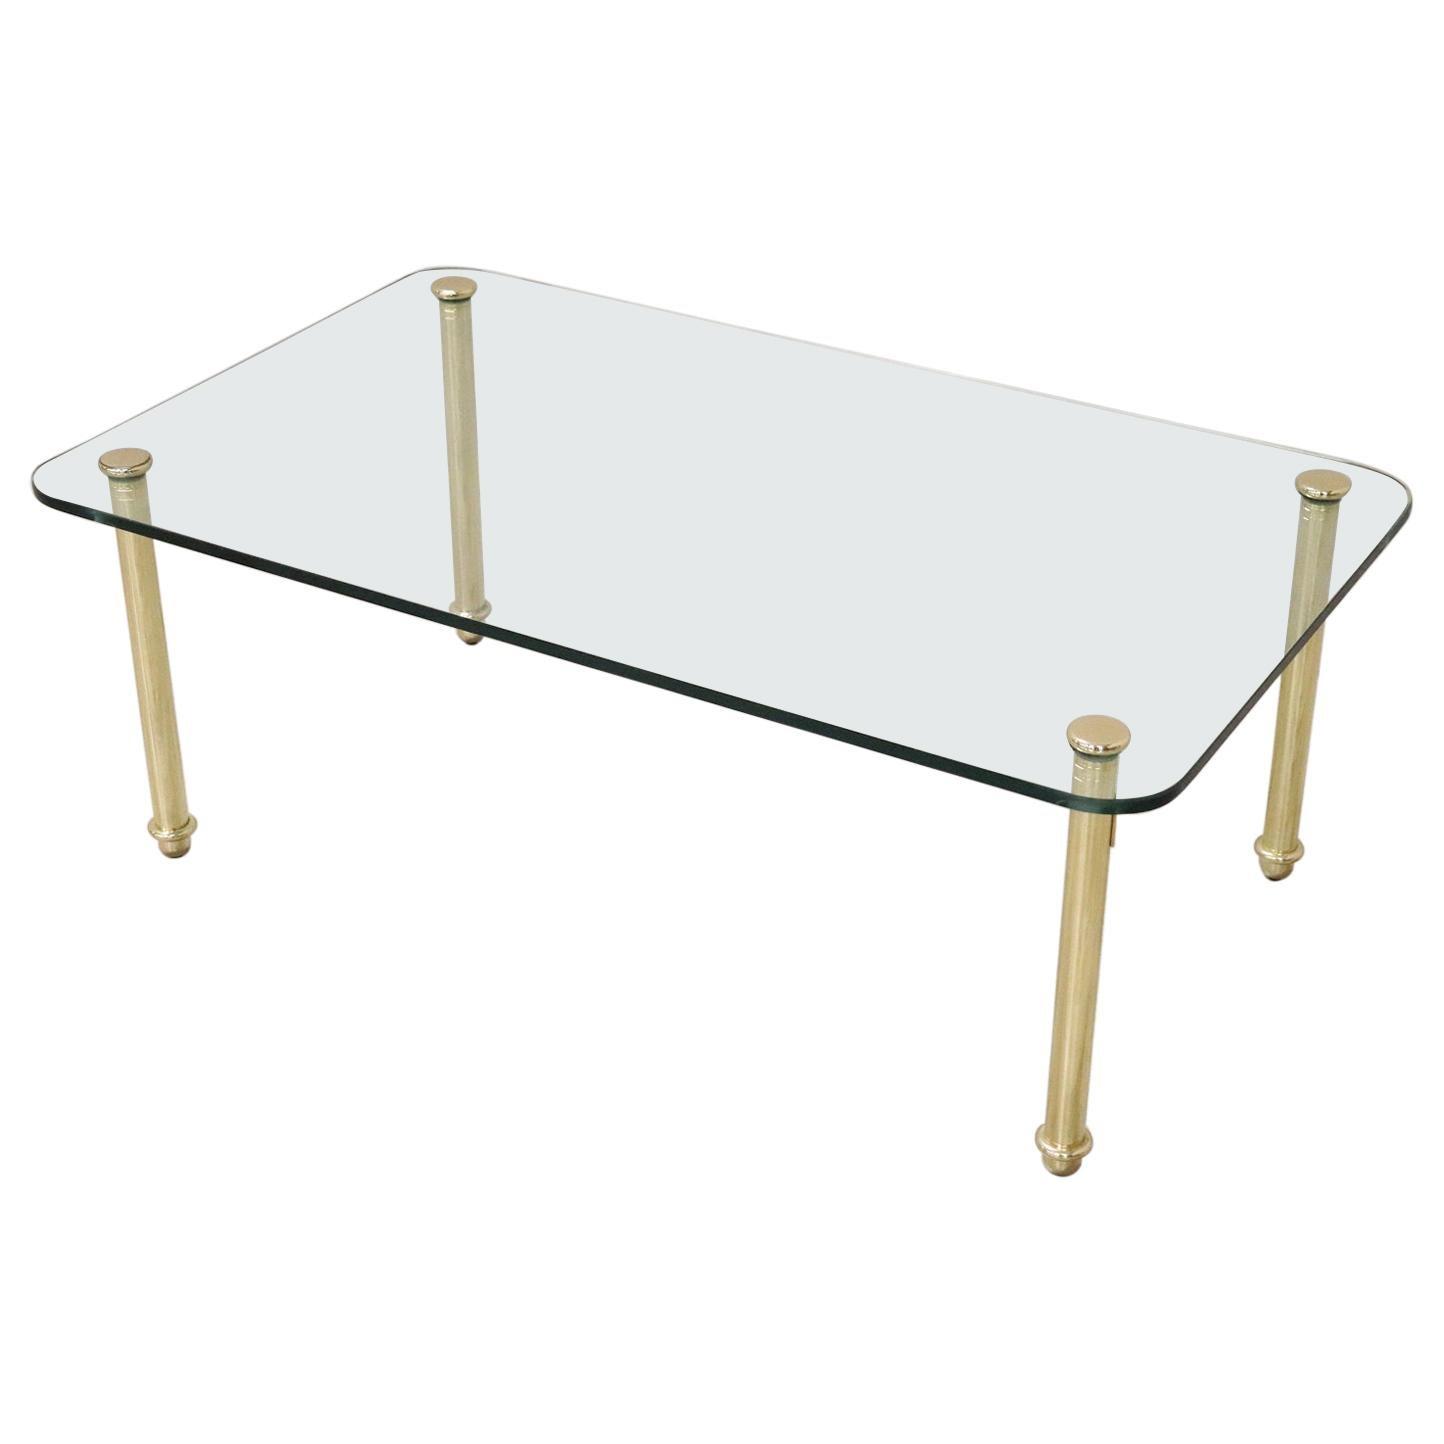 20th Century Italian Design Crystal Sofa Table or Coffee Table, 1980s